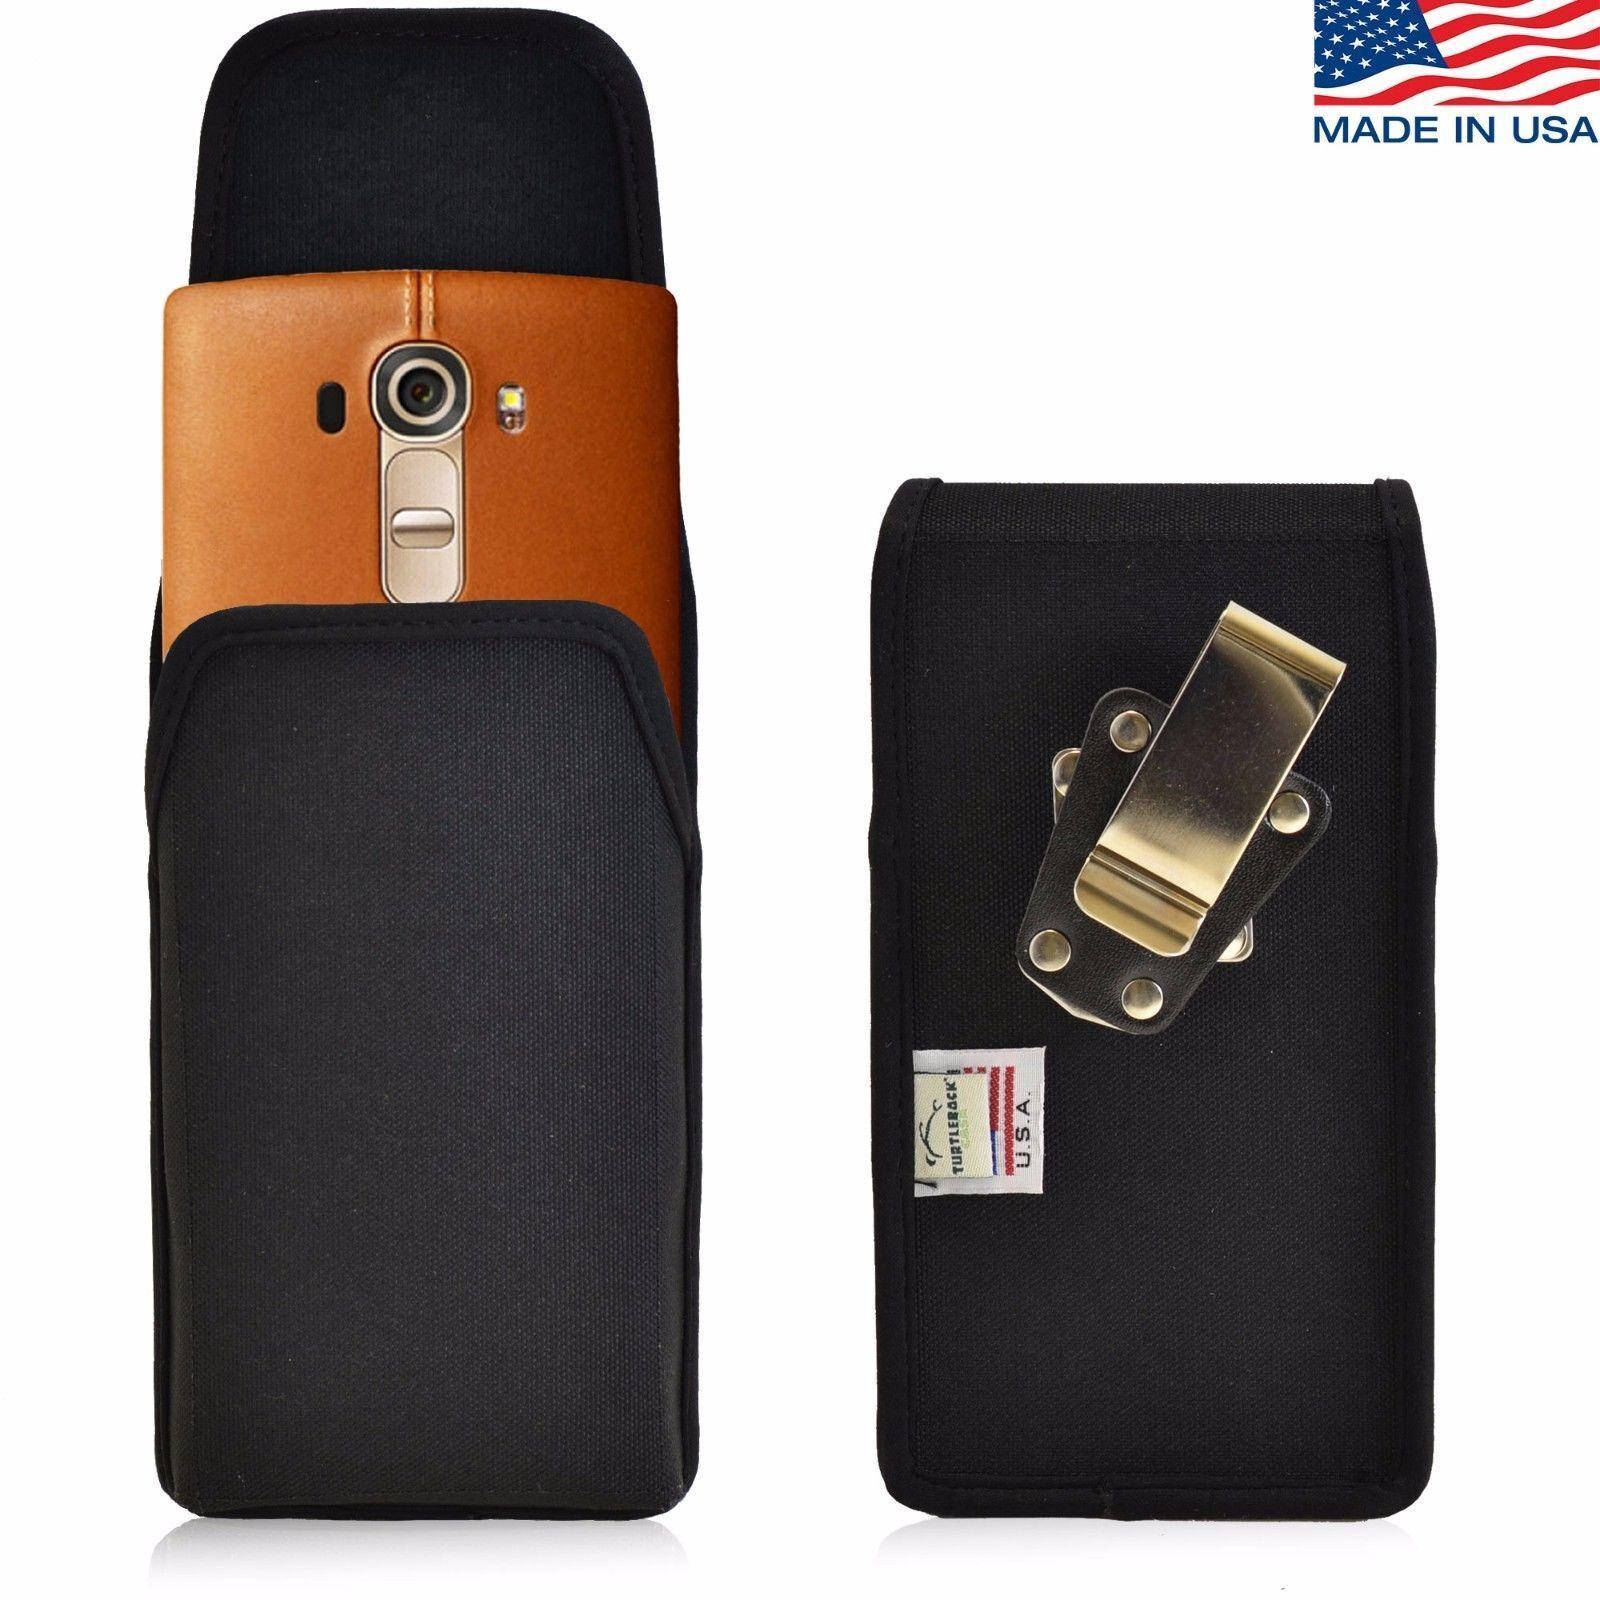 turtleback-vertical-nylon-holster-pouch-metal-belt-clip-phone-case-for-lg-g4